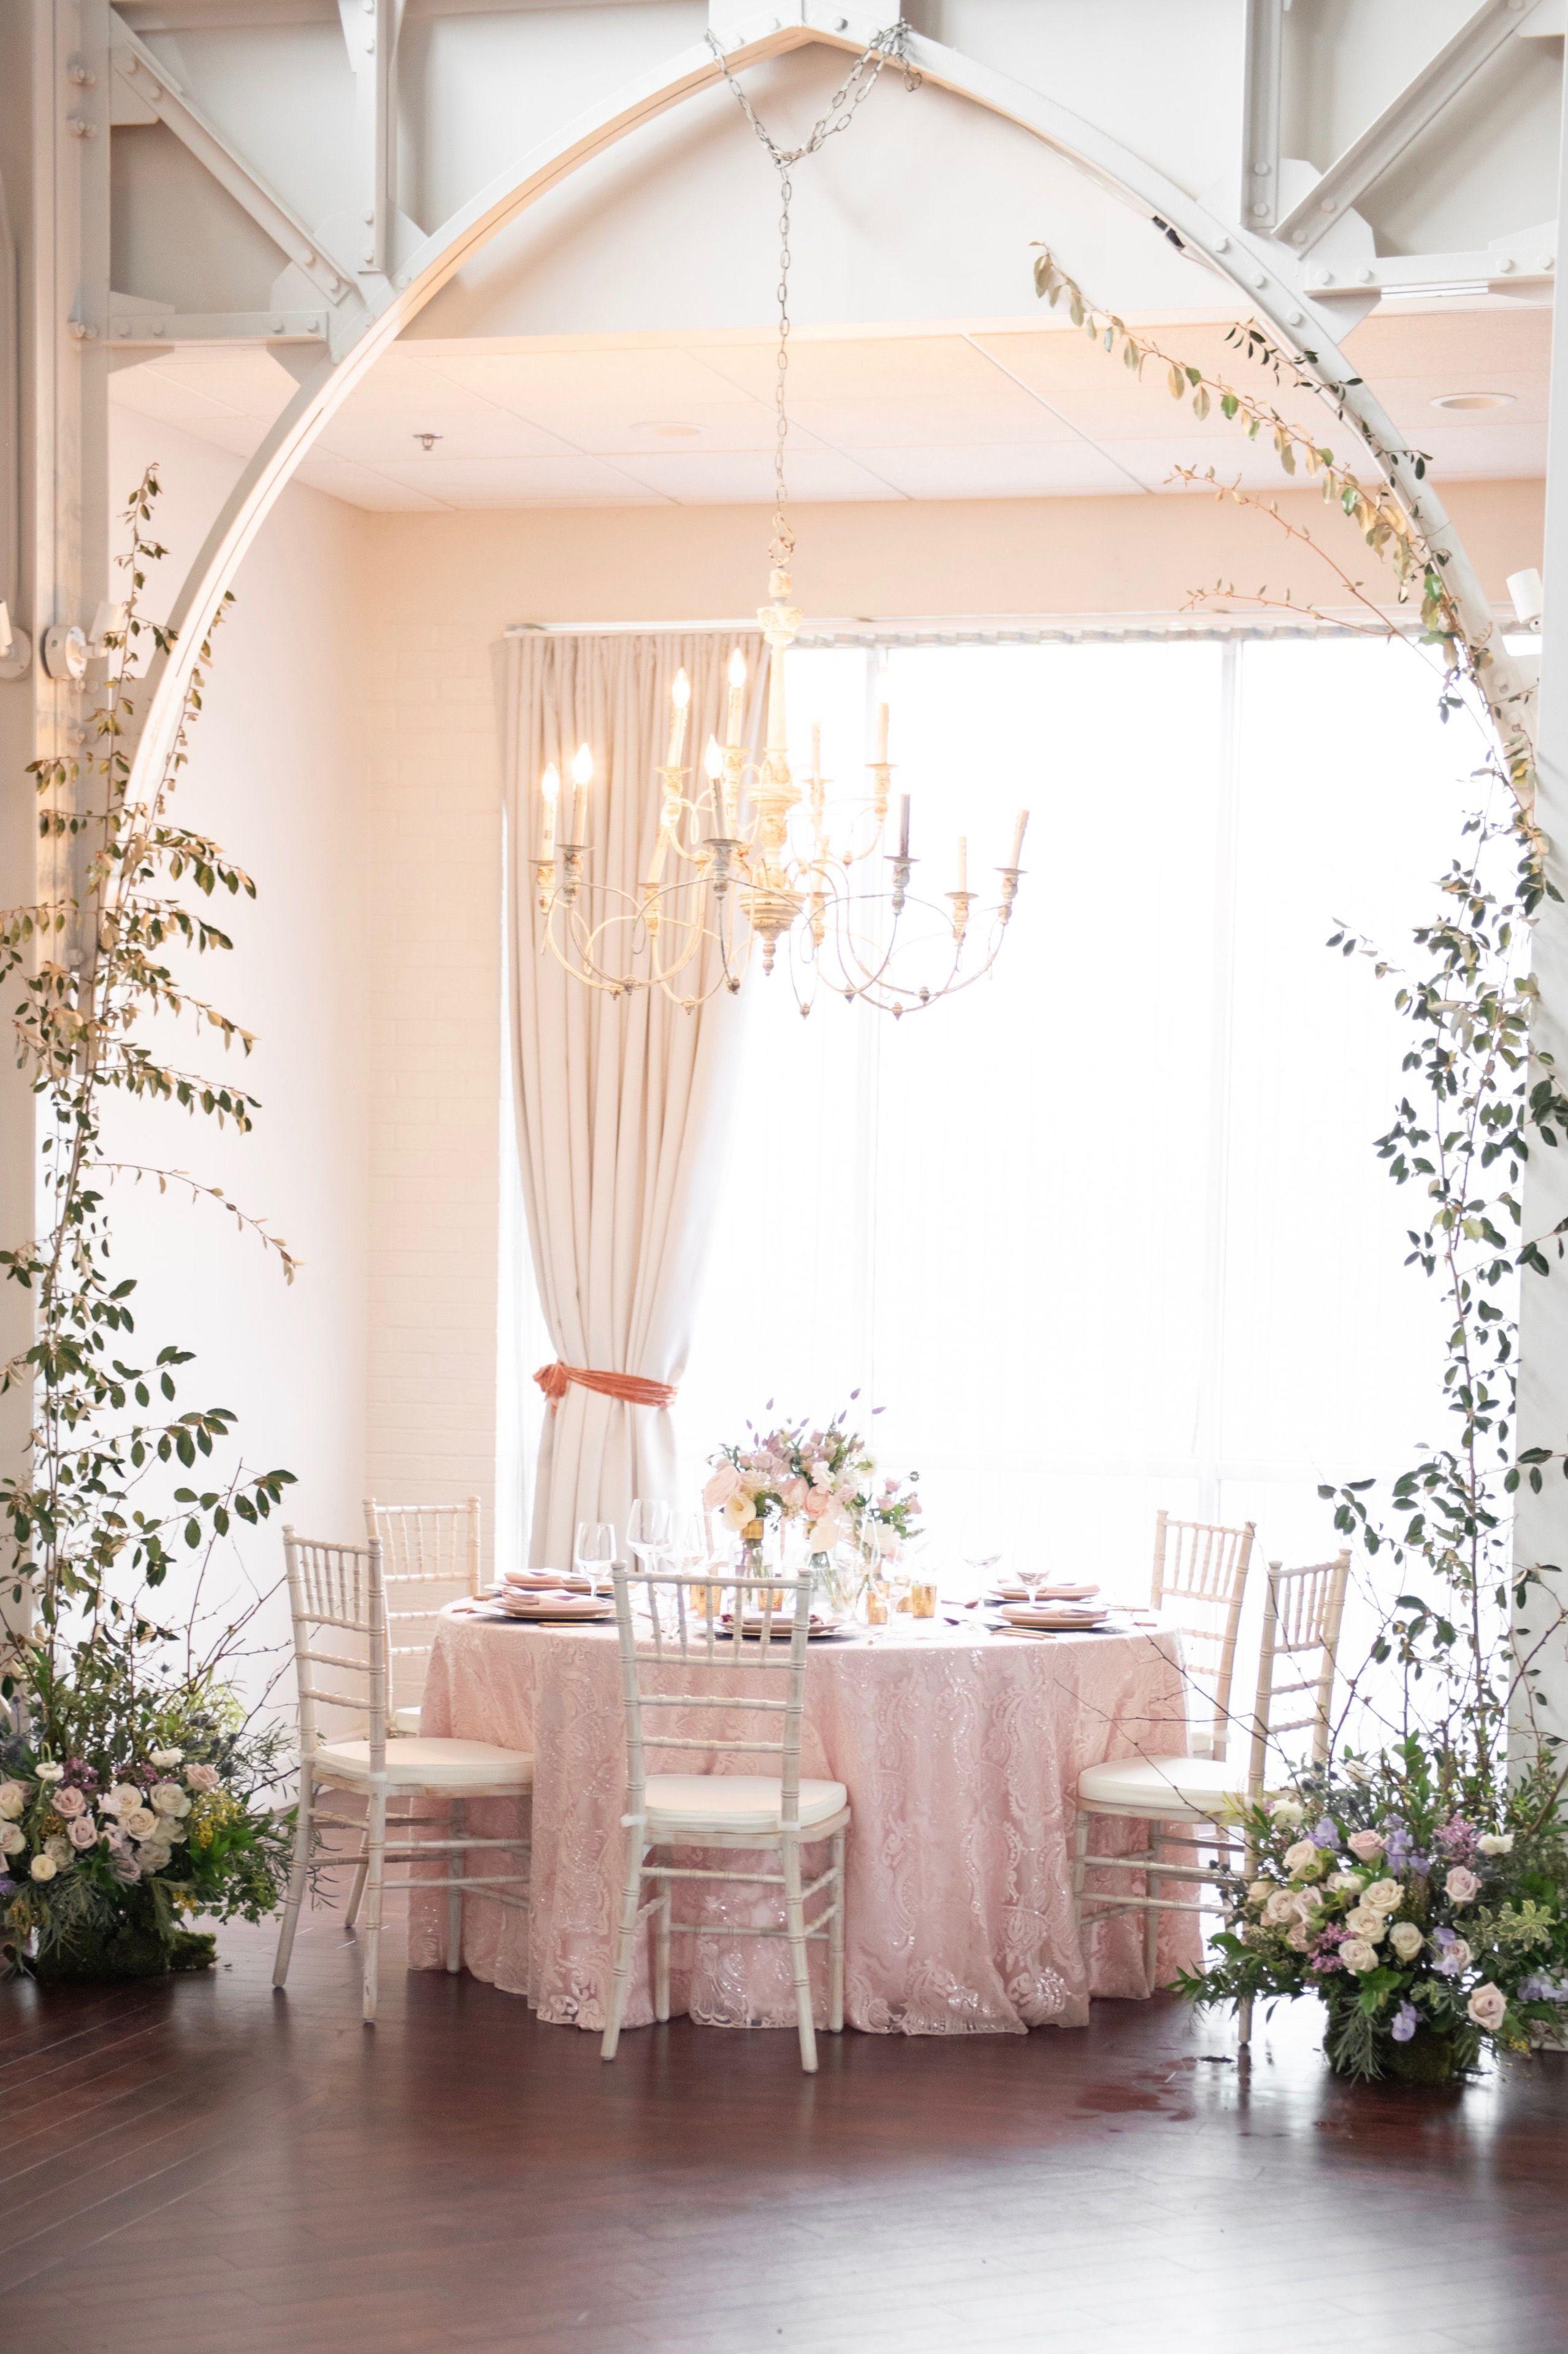 Vintage Romance + Whimsical Ivory Chandelier Elegant